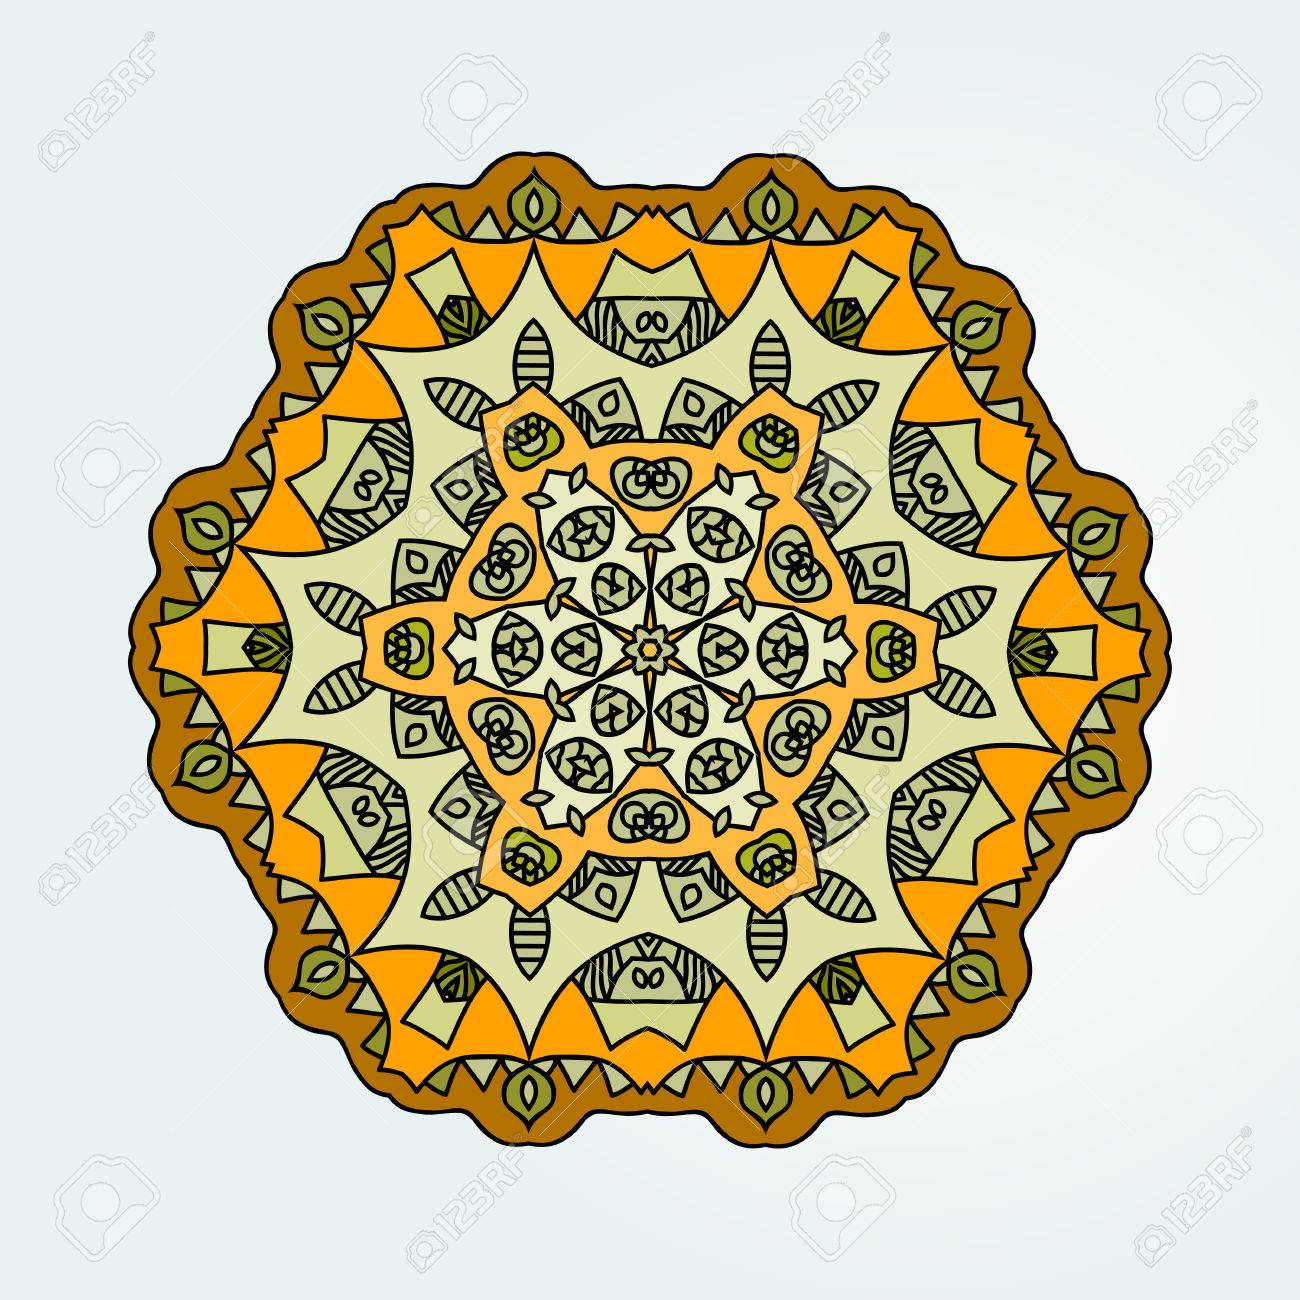 Buddhist Philosophy Mandala Yellow Color Lotus Pattern On The Background Yoga Asanas And Meditation